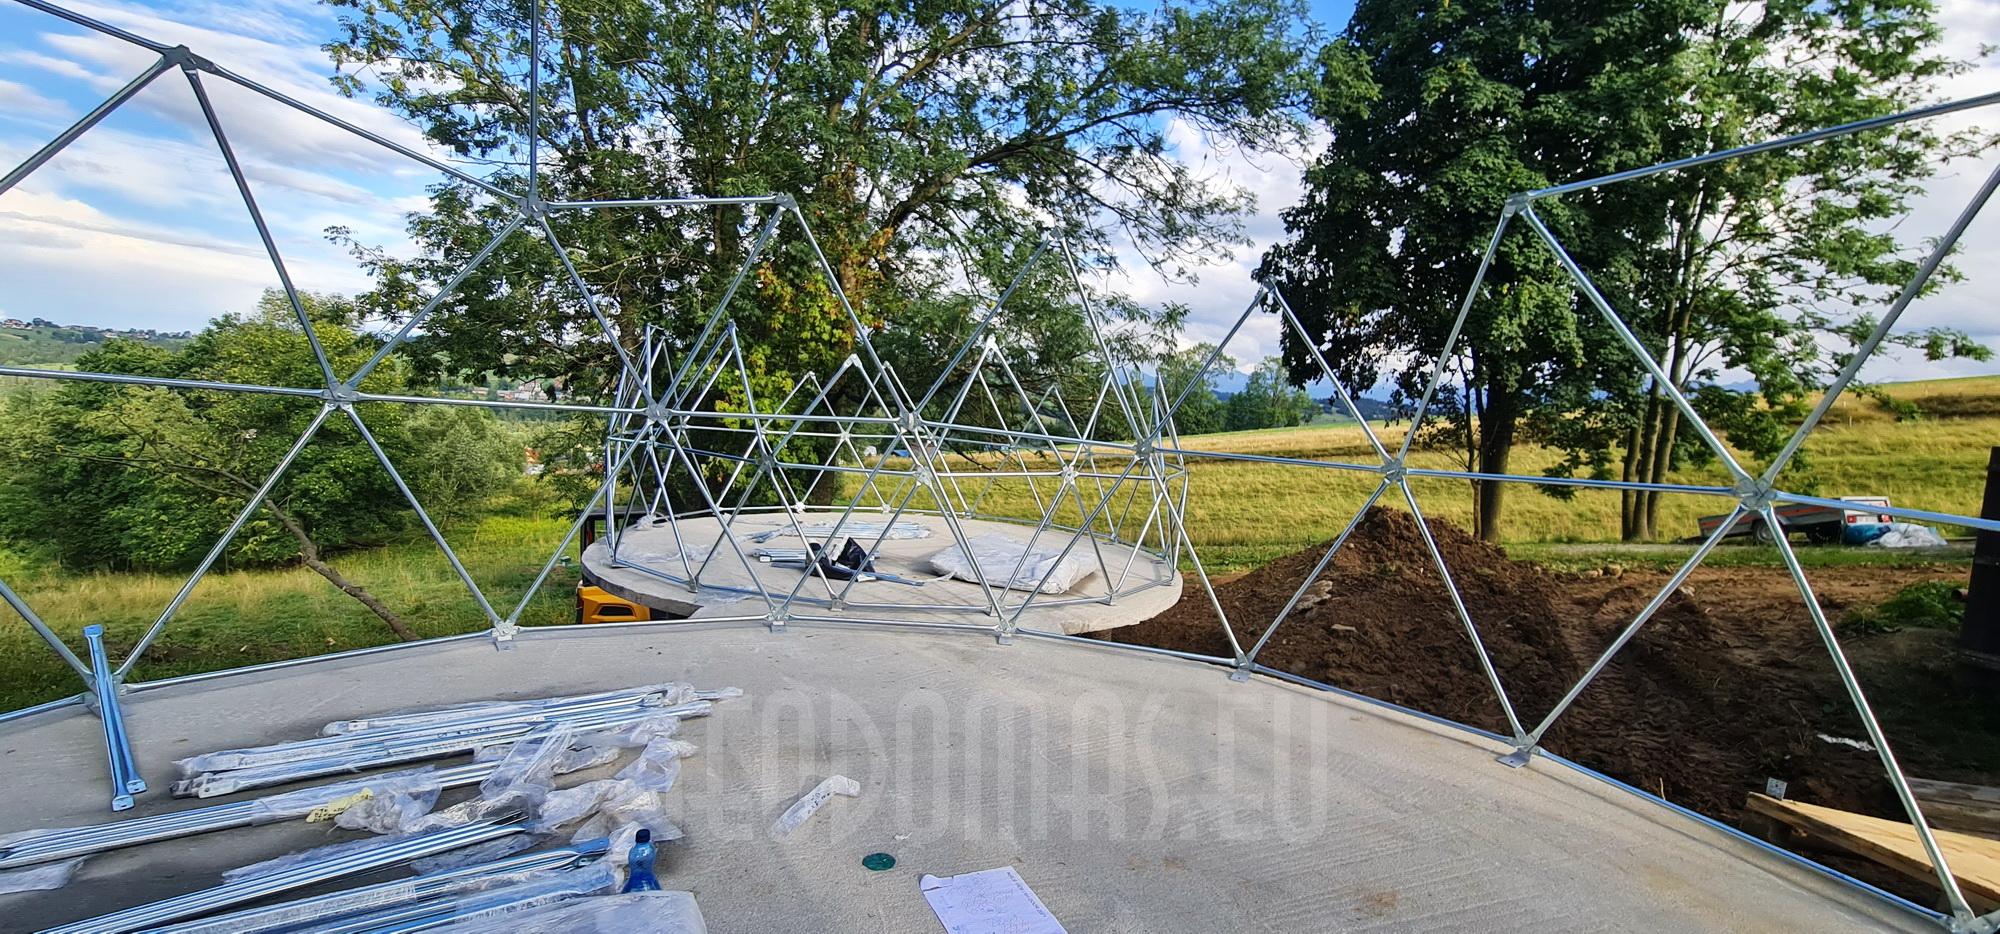 35m²+20m² Glamping SPA Domes Ø6,7m & Ø5m | Zakopane, Poland